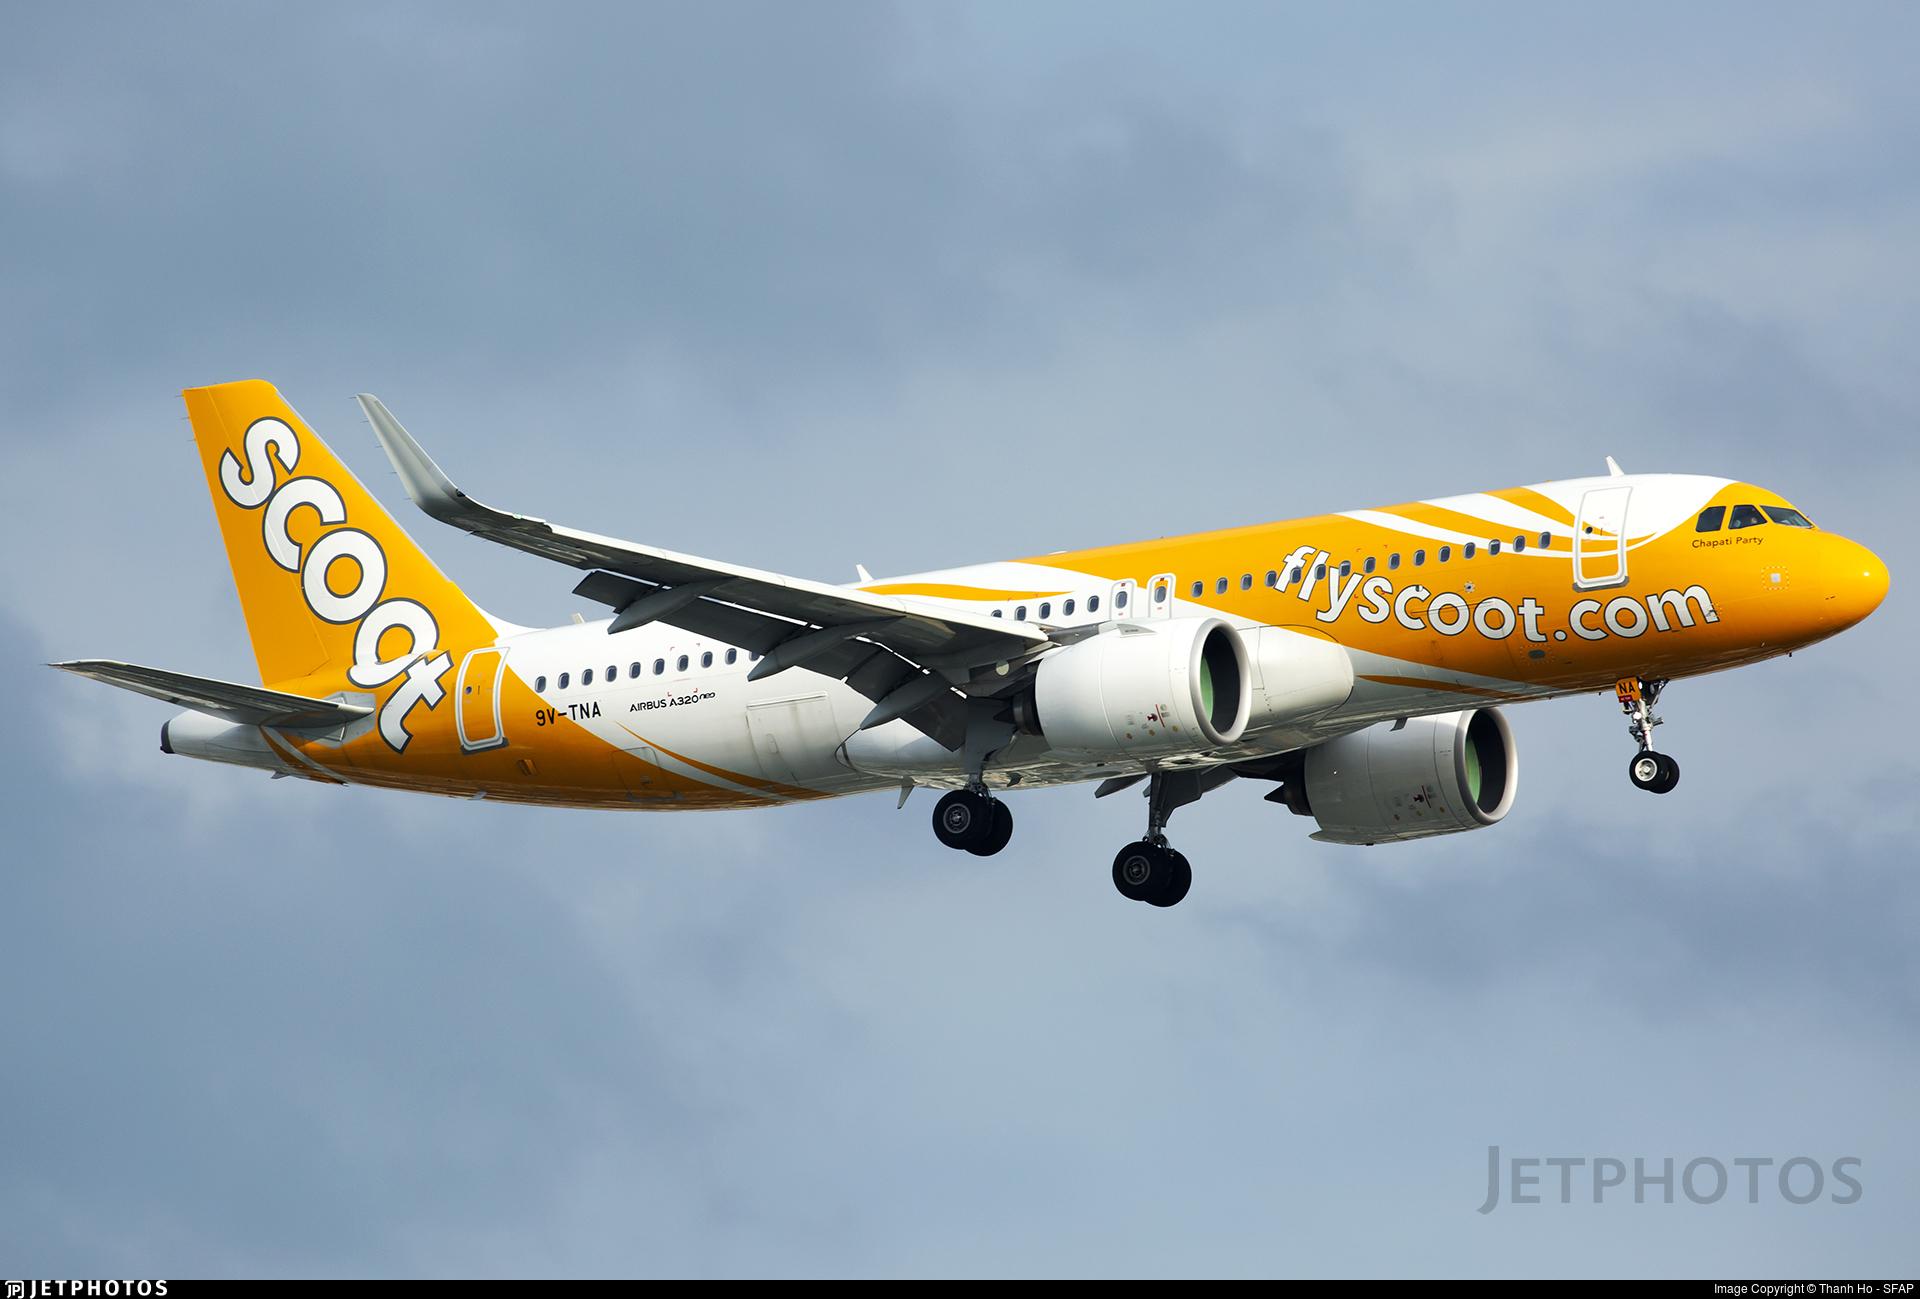 9V-TNA - Airbus A320-271N - Scoot